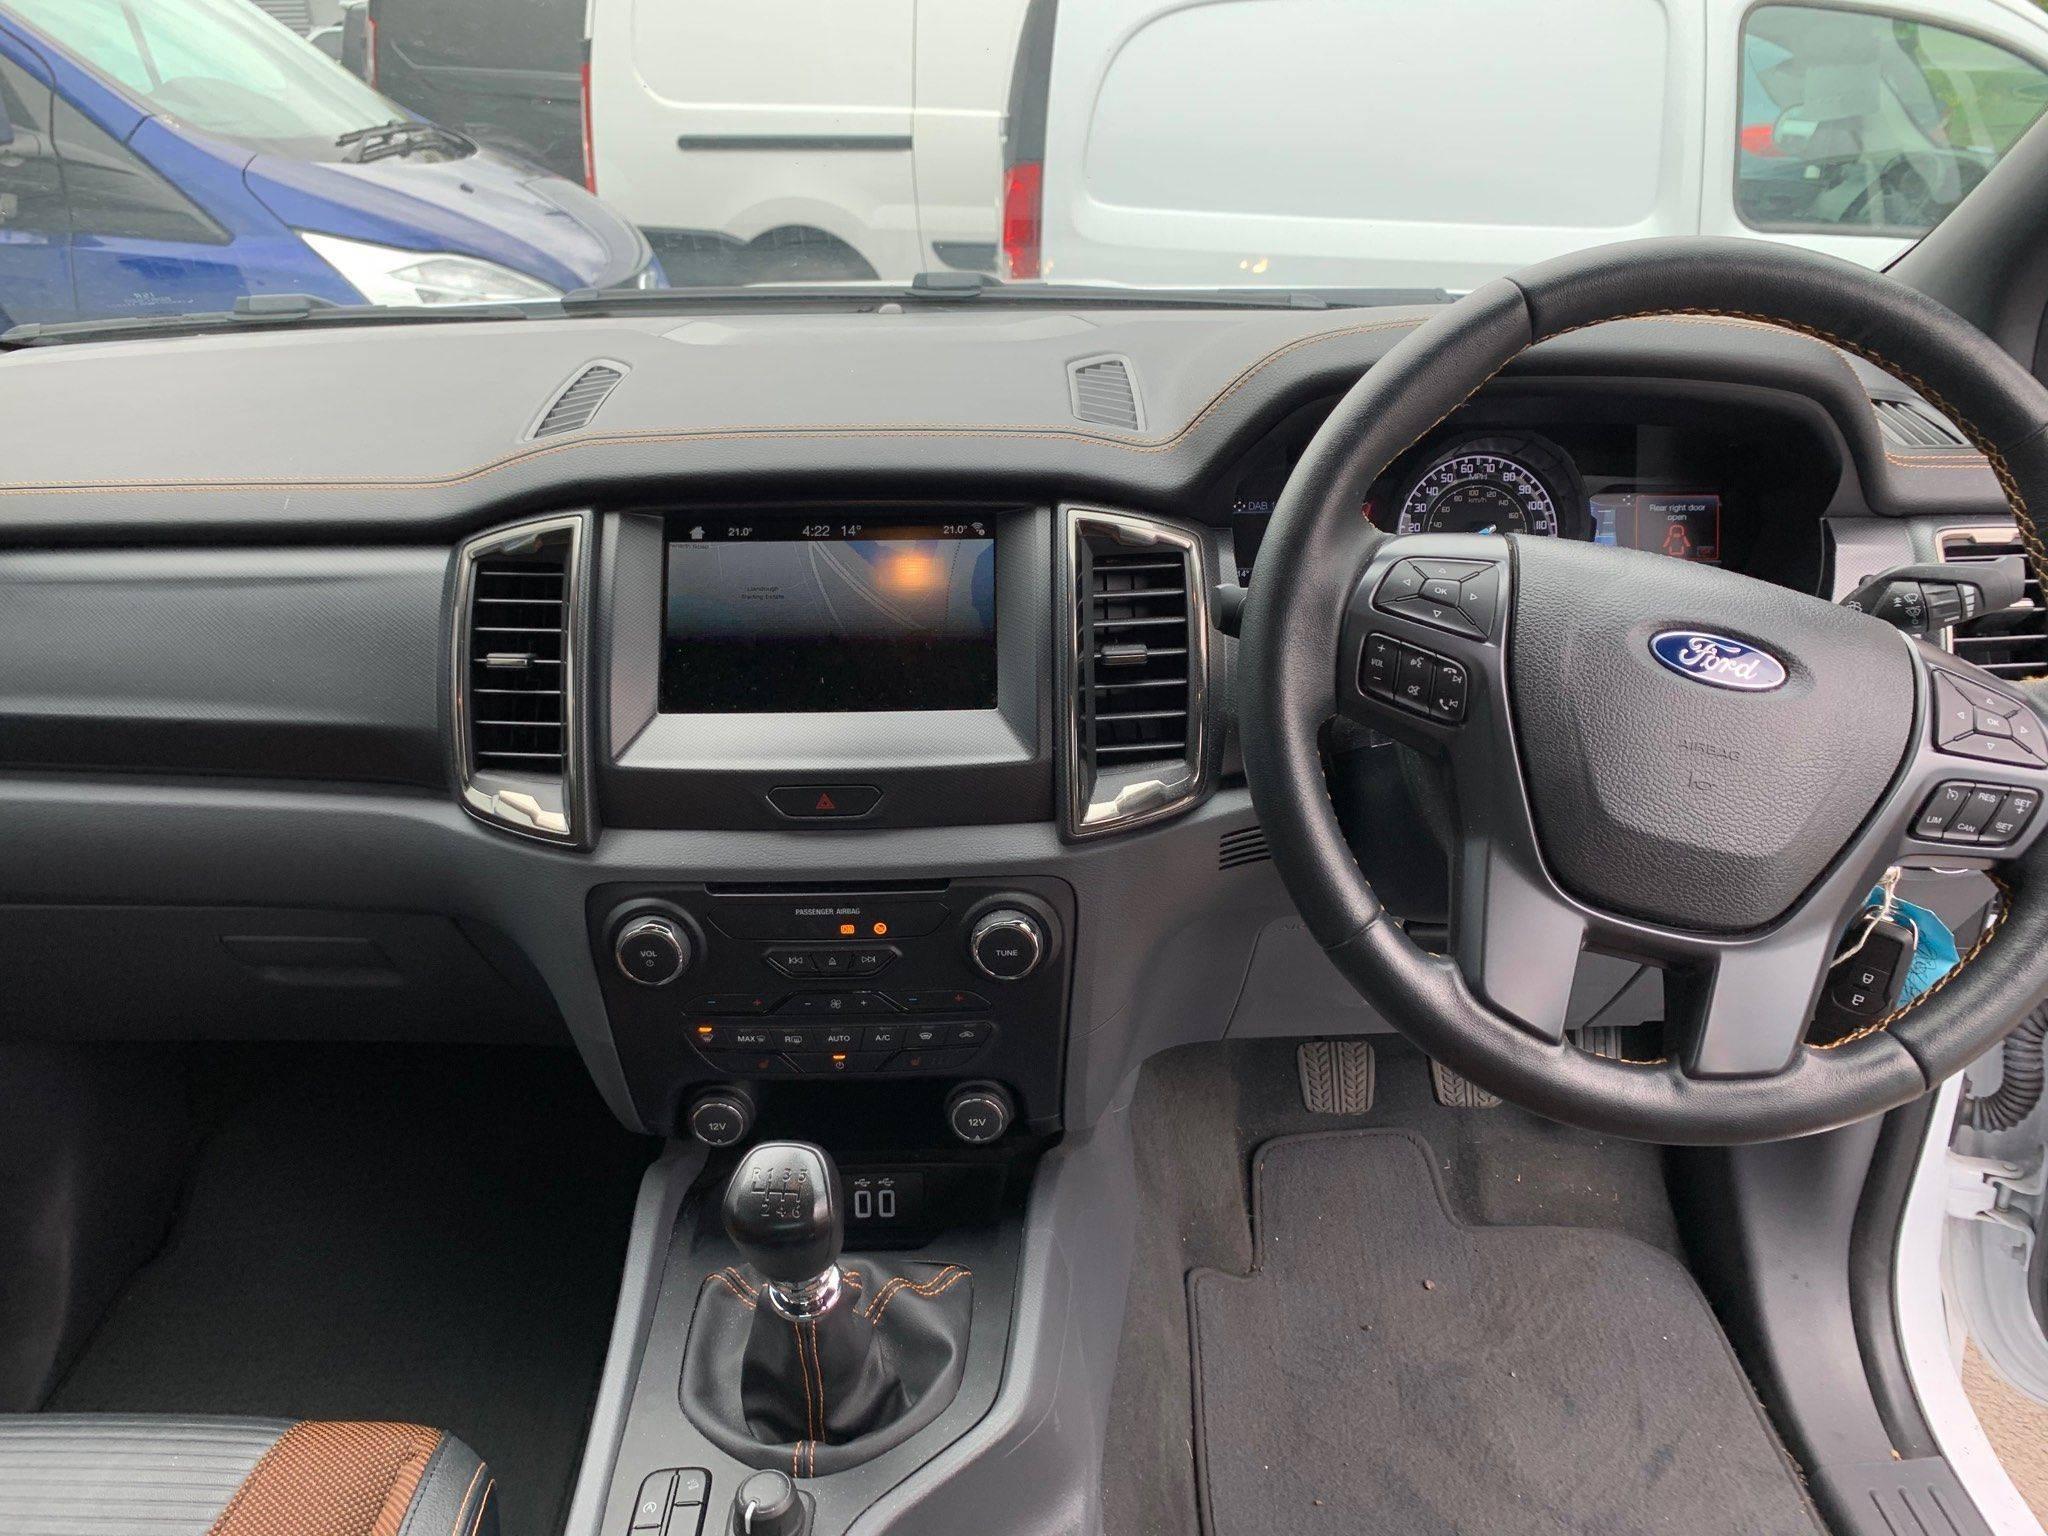 2020 Ford Ranger TDCi Wildtrak Double Cab full